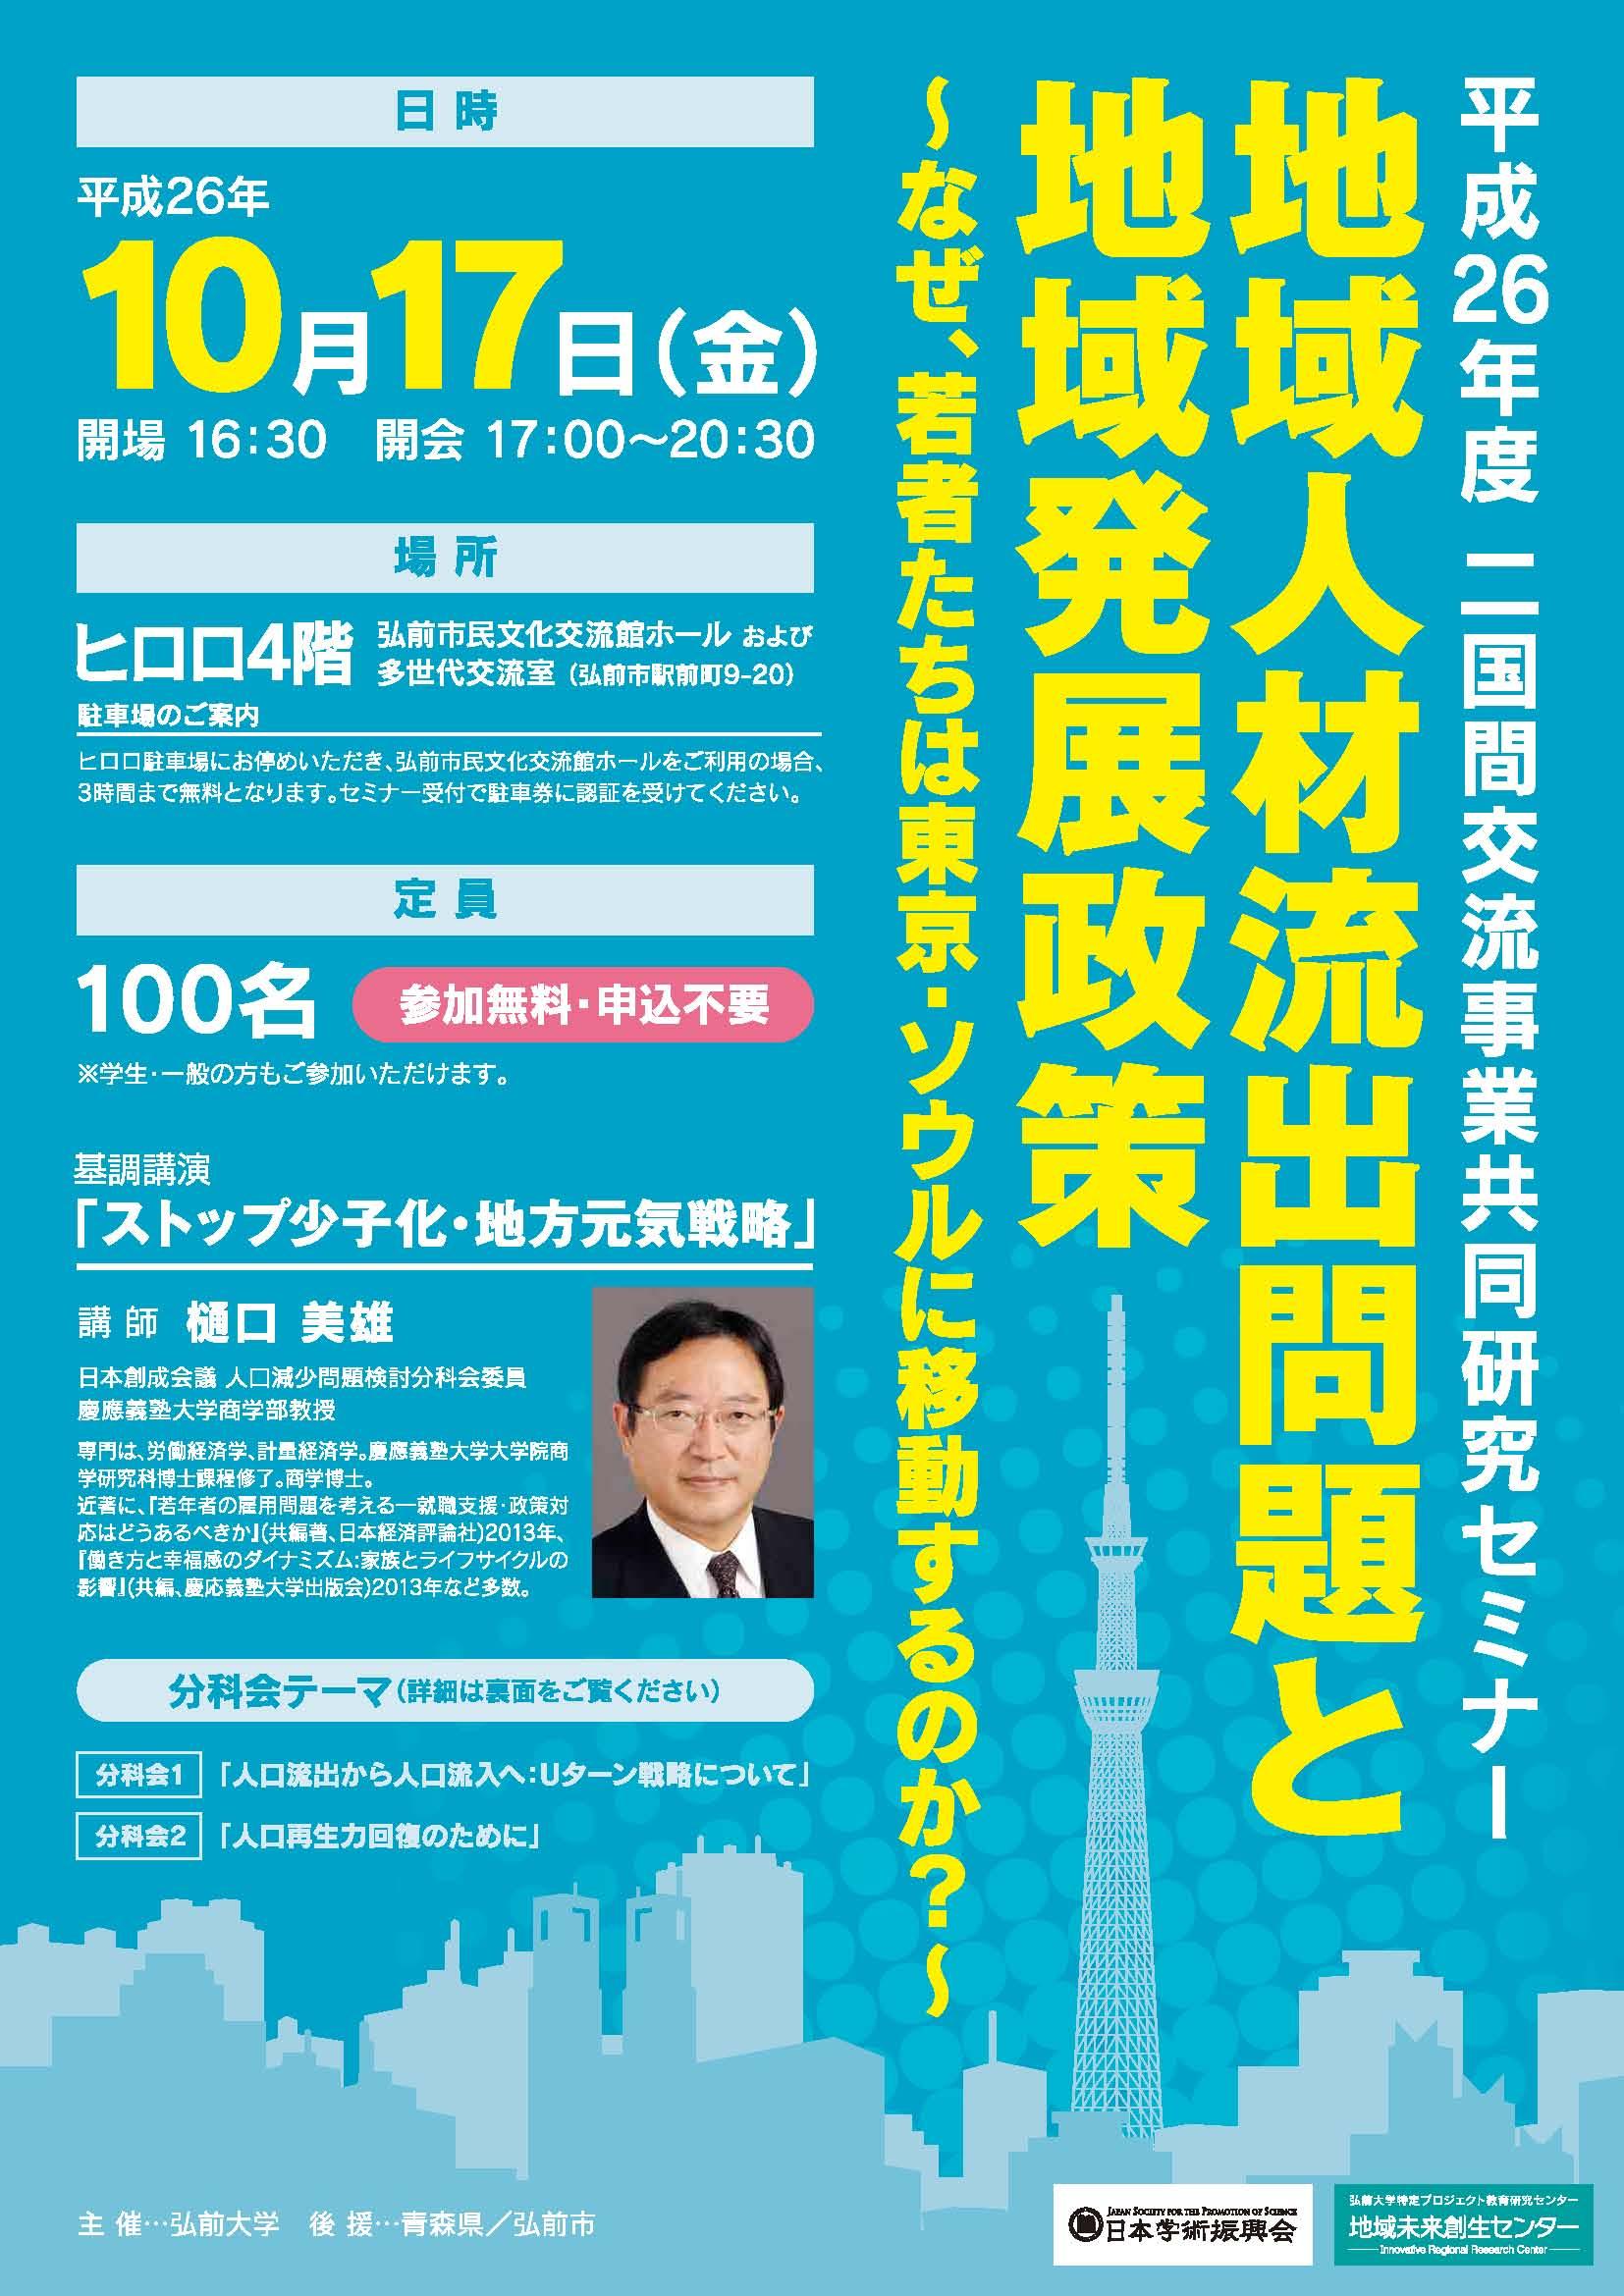 20141017_seminar_ページ_1